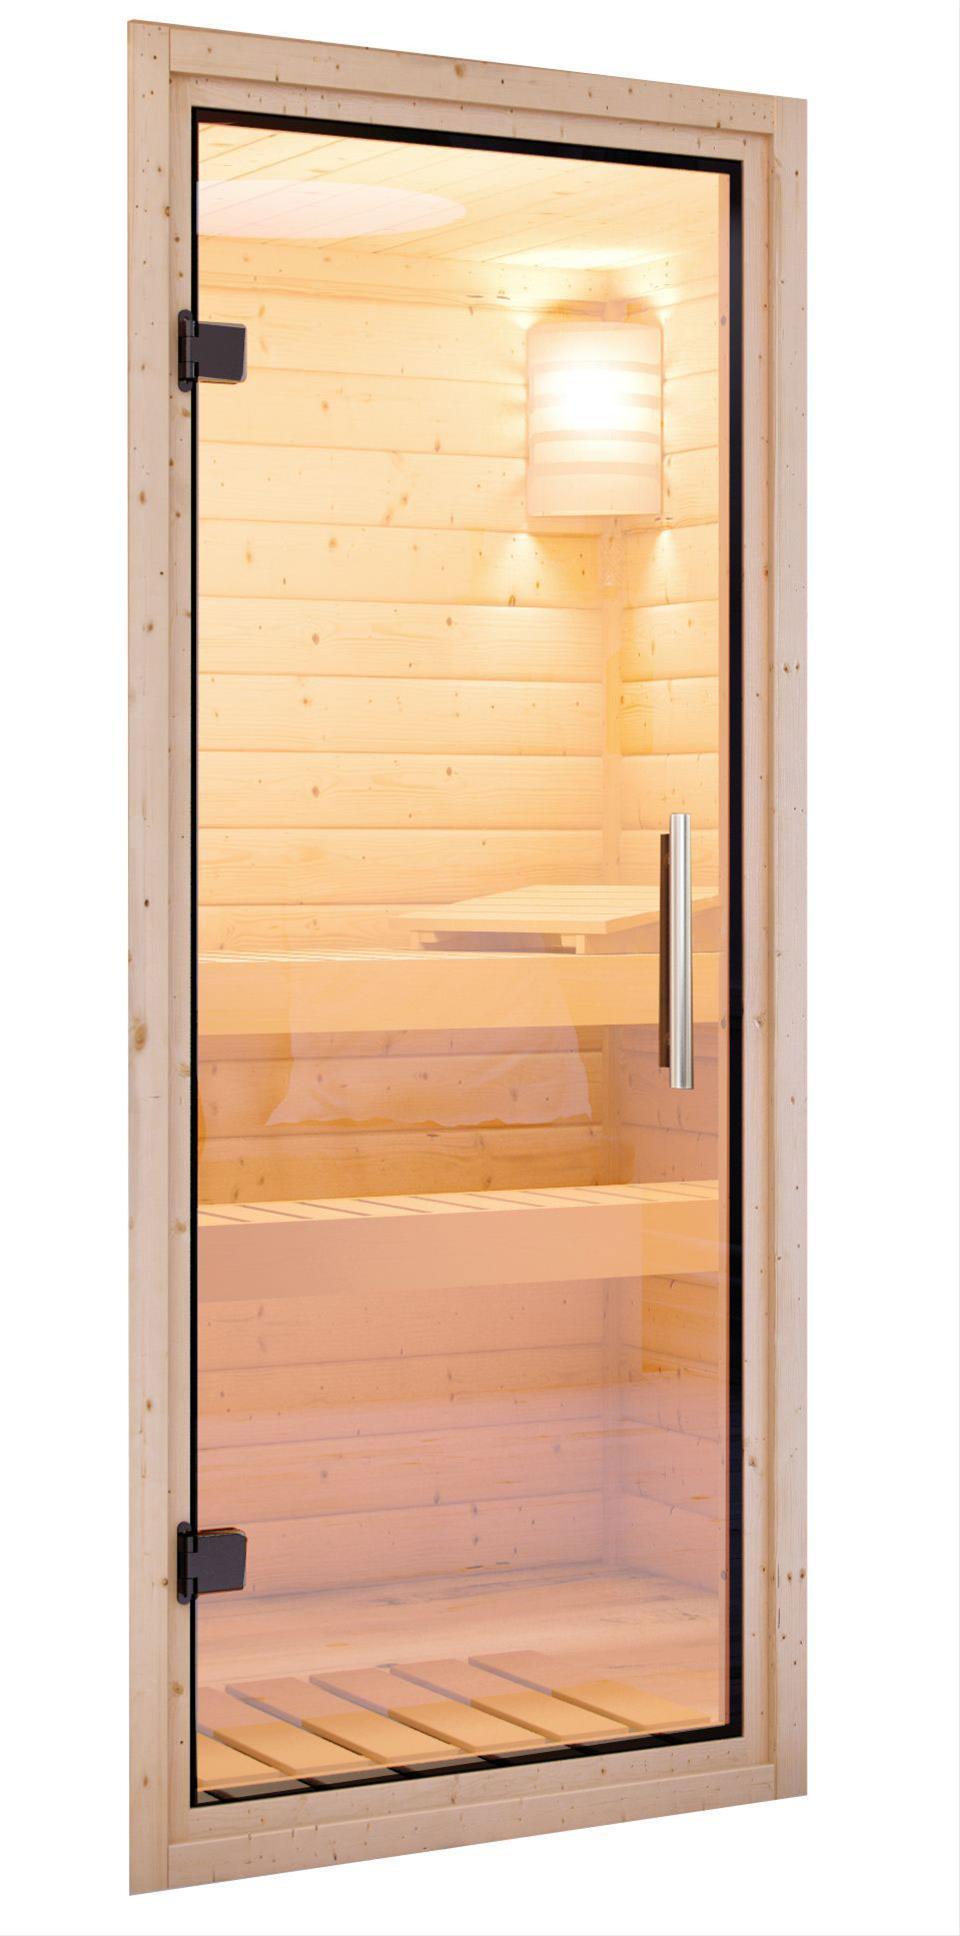 Woodfeeling Sauna Karla 38mm Kranz Ofen 9kW intern Tür Klarglas Bild 8